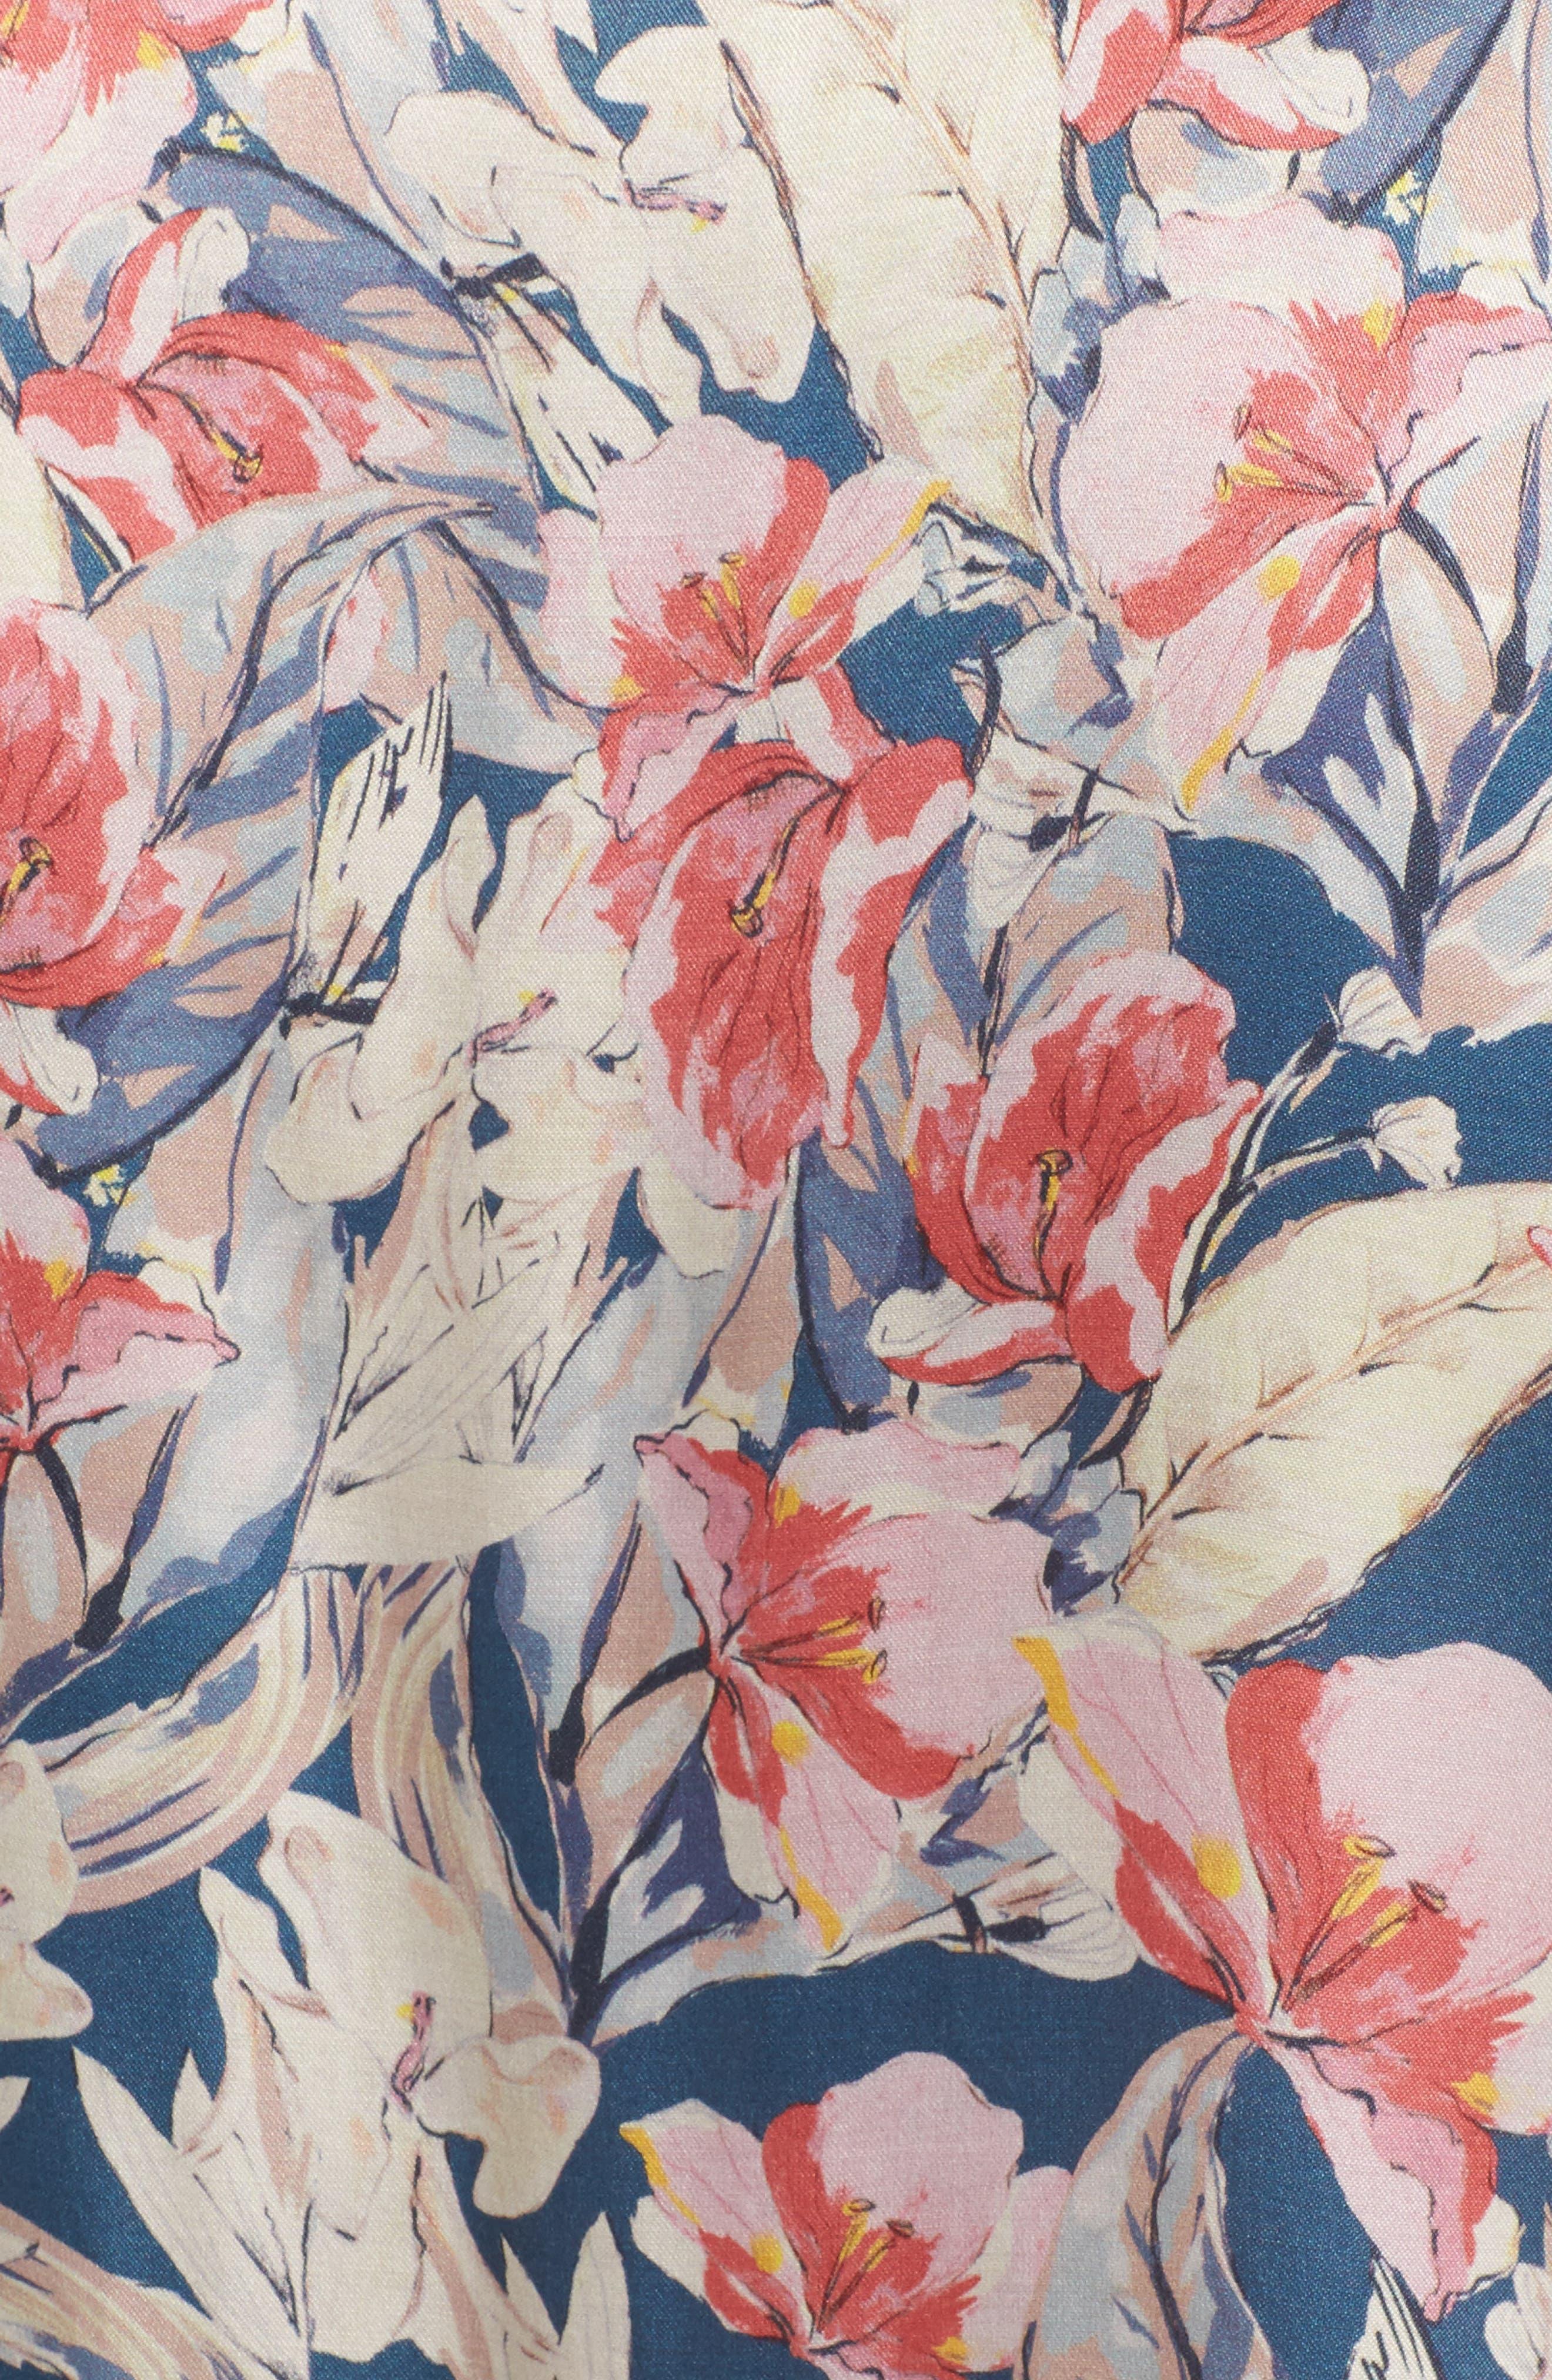 Lena Floral Print Top,                             Alternate thumbnail 5, color,                             900